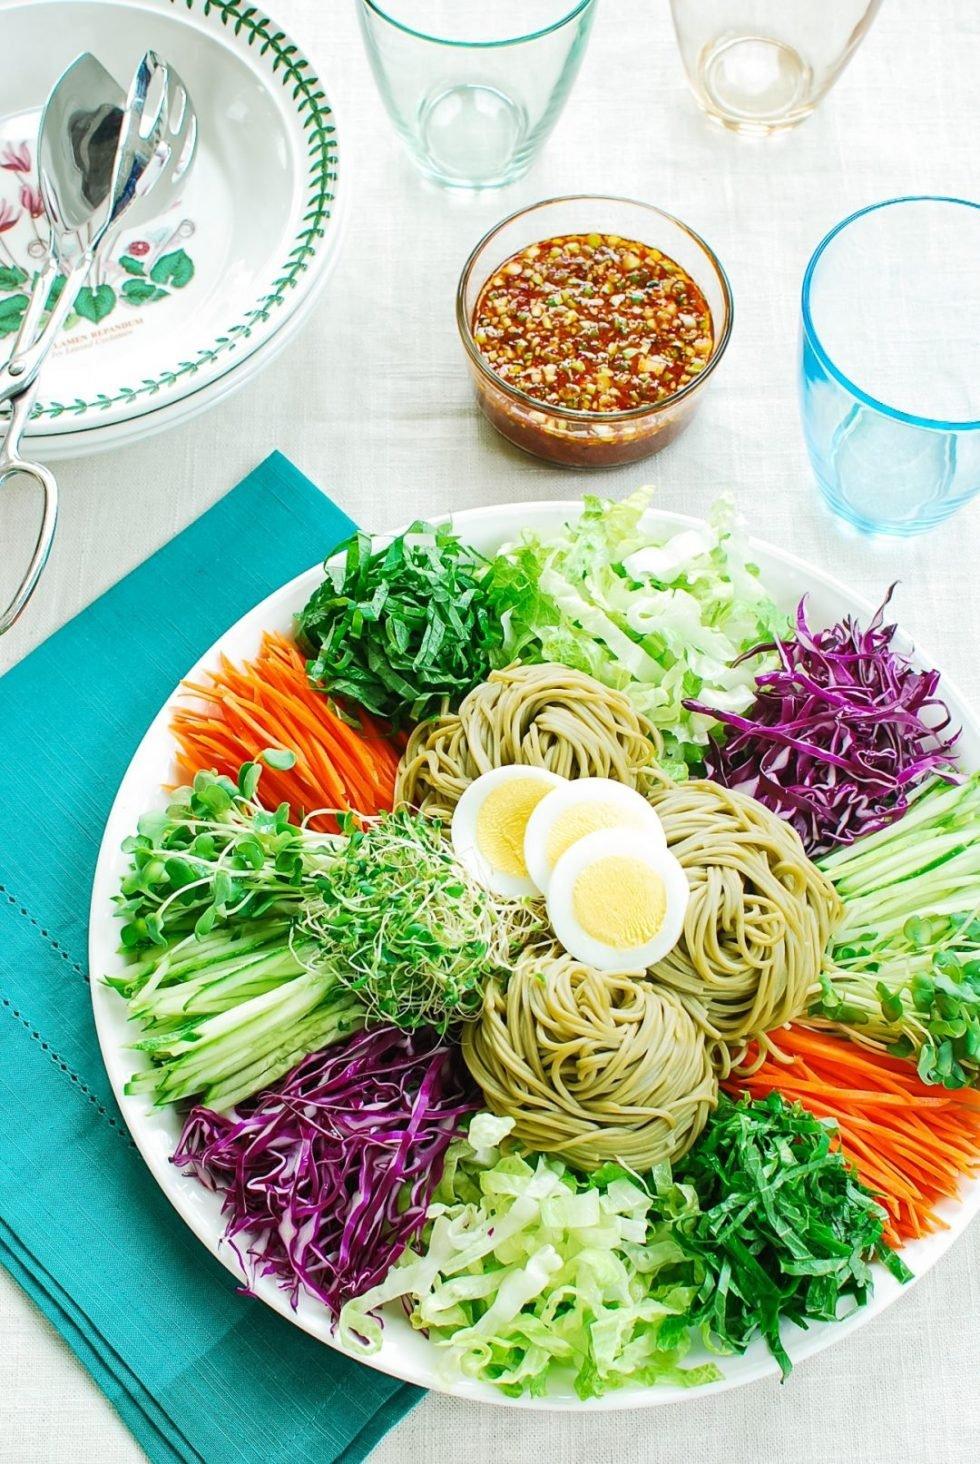 DSC 0617 e1621008504593 - Jaengban Guksu (Cold Noodles and Vegetables)